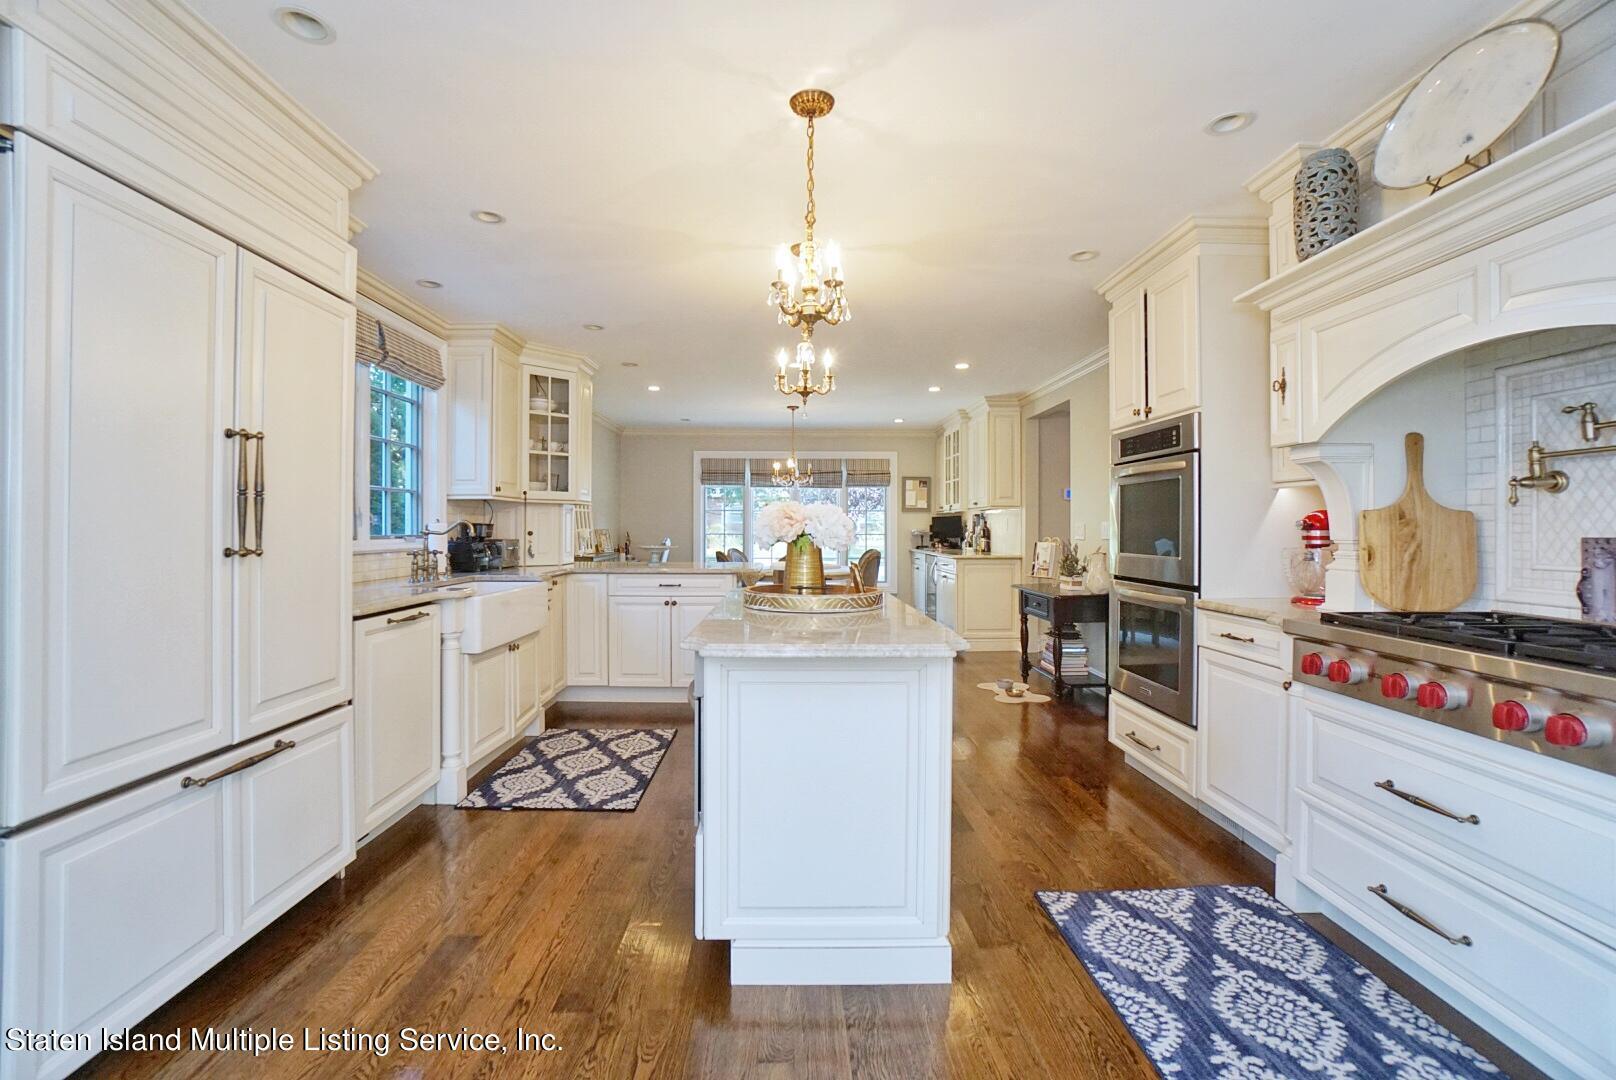 Single Family - Detached 116 Fine Blvd   Staten Island, NY 10314, MLS-1148291-24